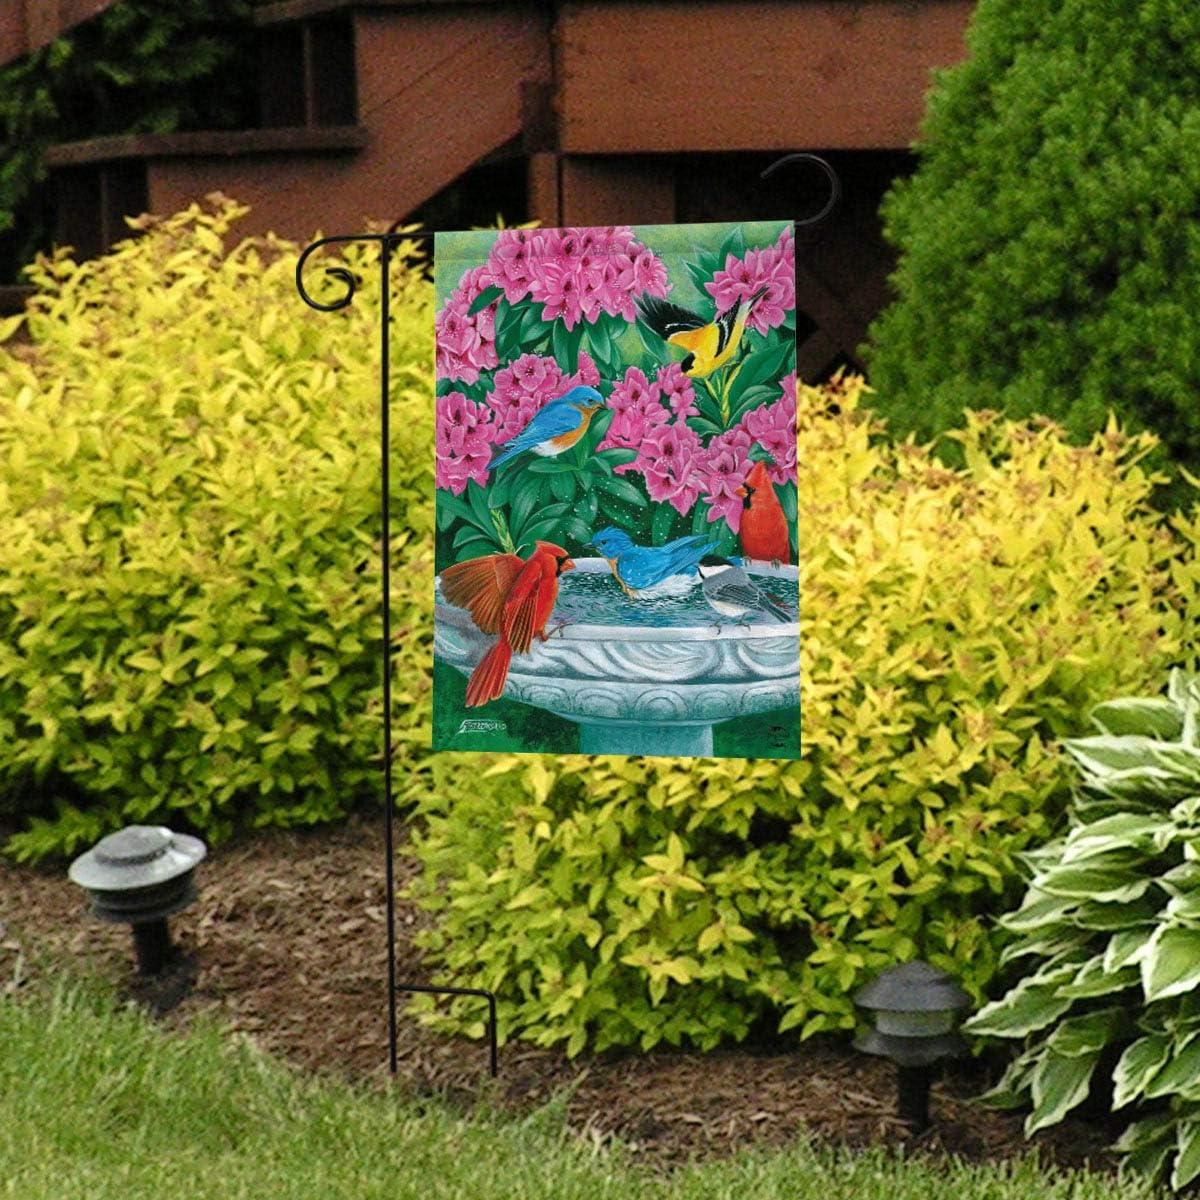 Briarwood Lane Splish Splash Birdbath Spring Garden Flag Birds Floral 12.5x18